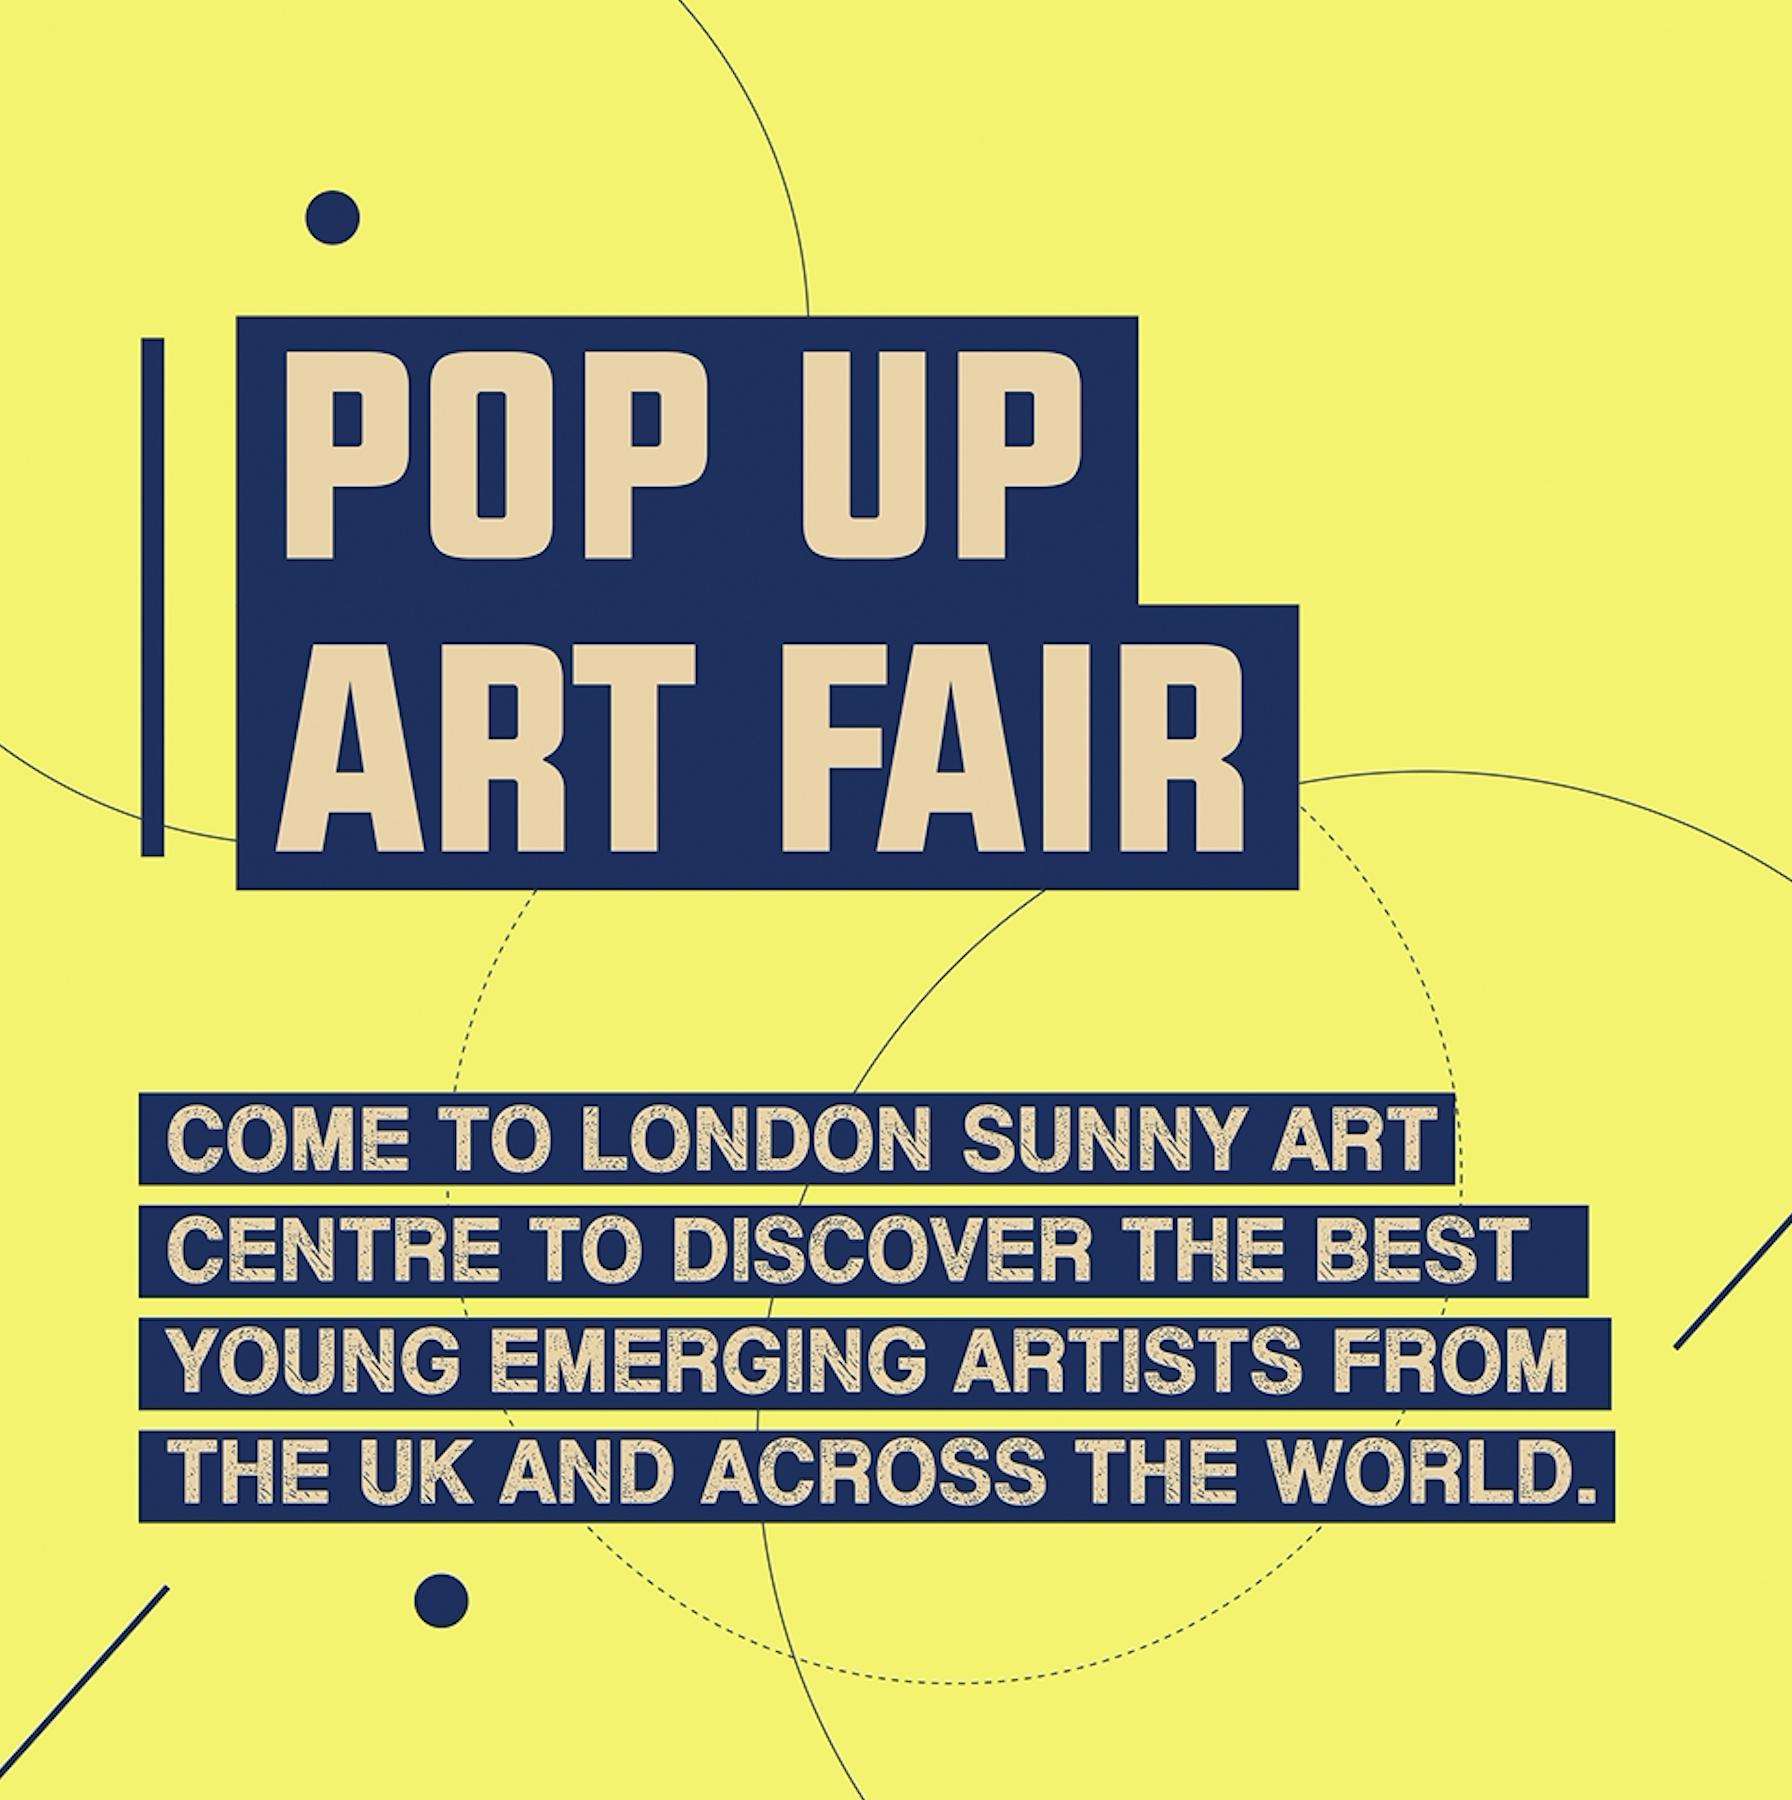 The London Pop Up Art Fair